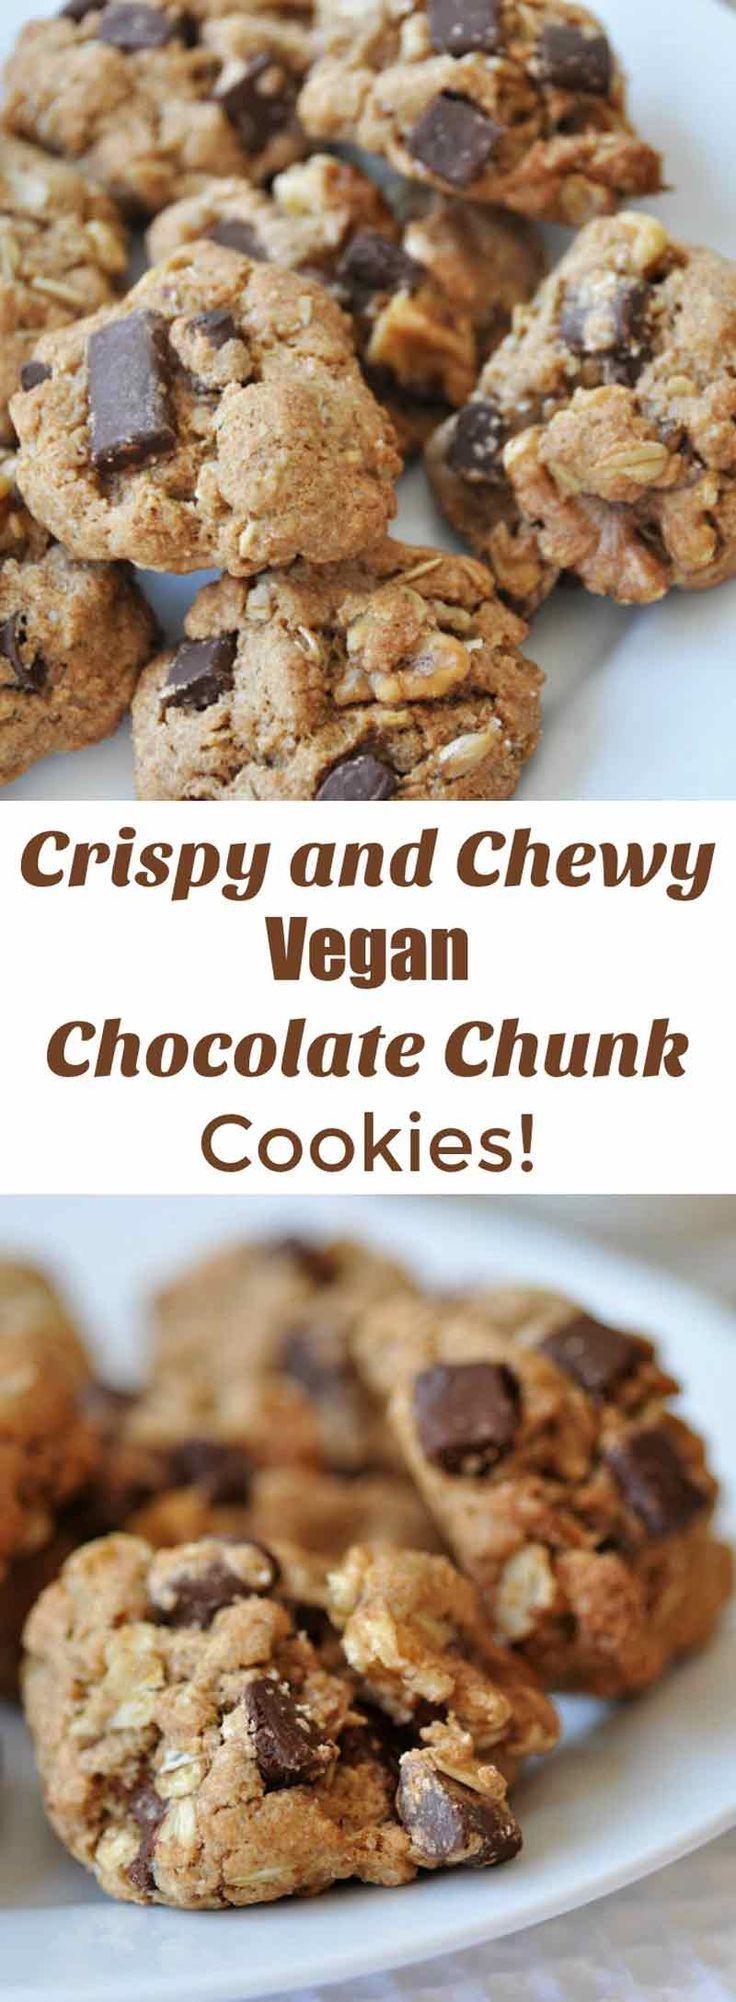 Healthy Oatmeal Cookies With Coconut Oil  Crispy Vegan Chocolate Chunk Oatmeal Cookies